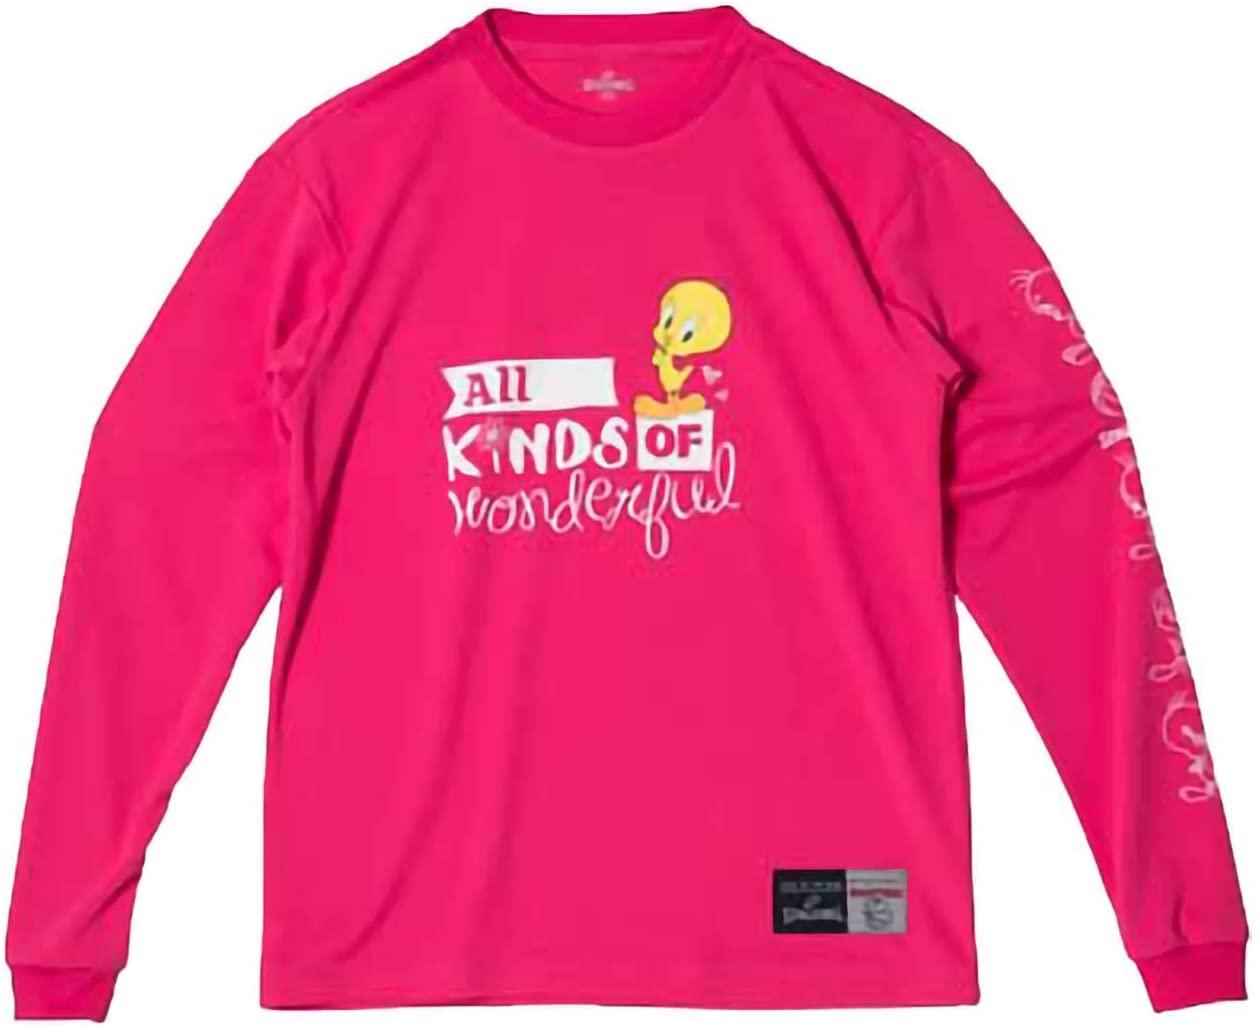 SPALDING 安値 スポルディング L S Tシャツ ピンク セール開催中最短即日発送 TWEETY WONDERFUL XXSサイズ